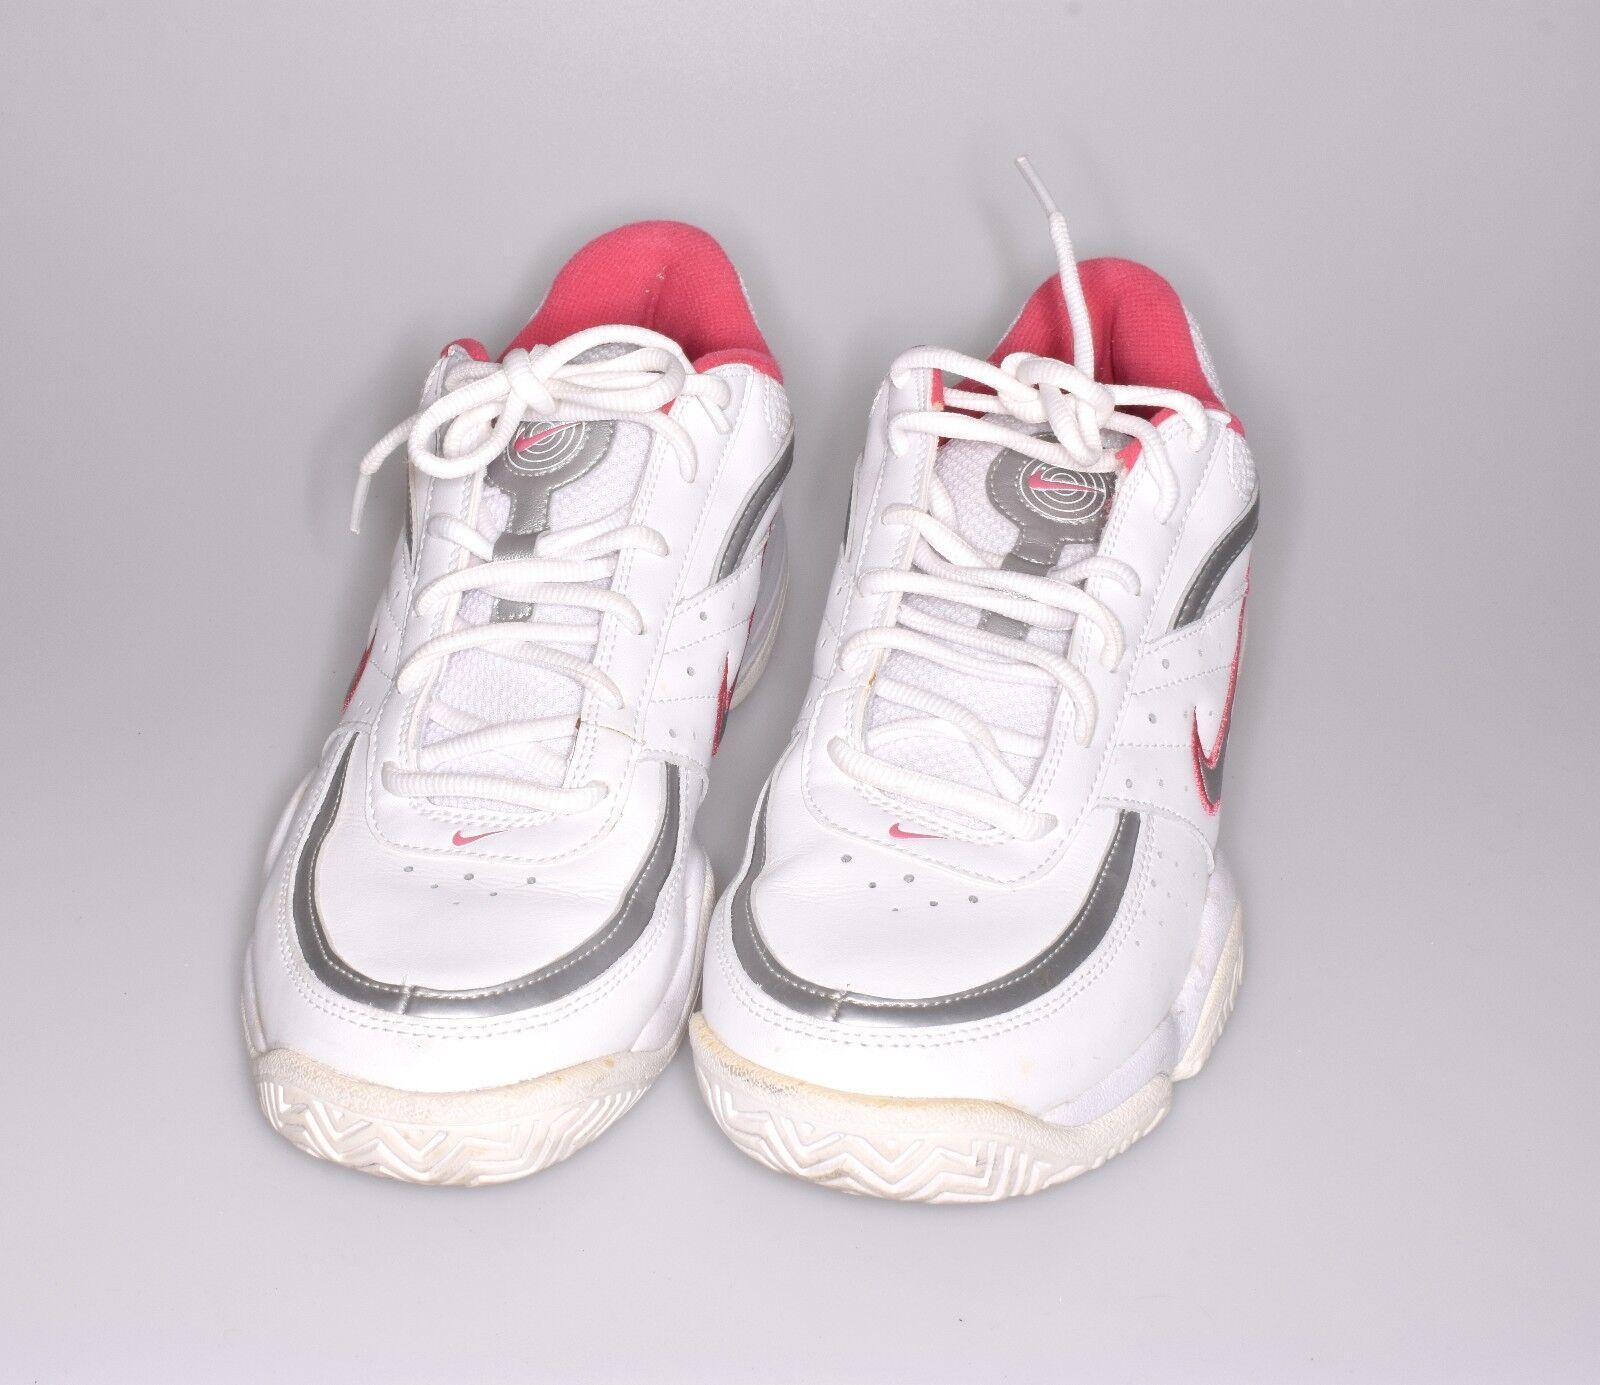 NIKE shoe rosa Turnschuhe 7 pink US 9.5 UK 7 Turnschuhe EURO 41 26.5 cm 315240-102 62ca01